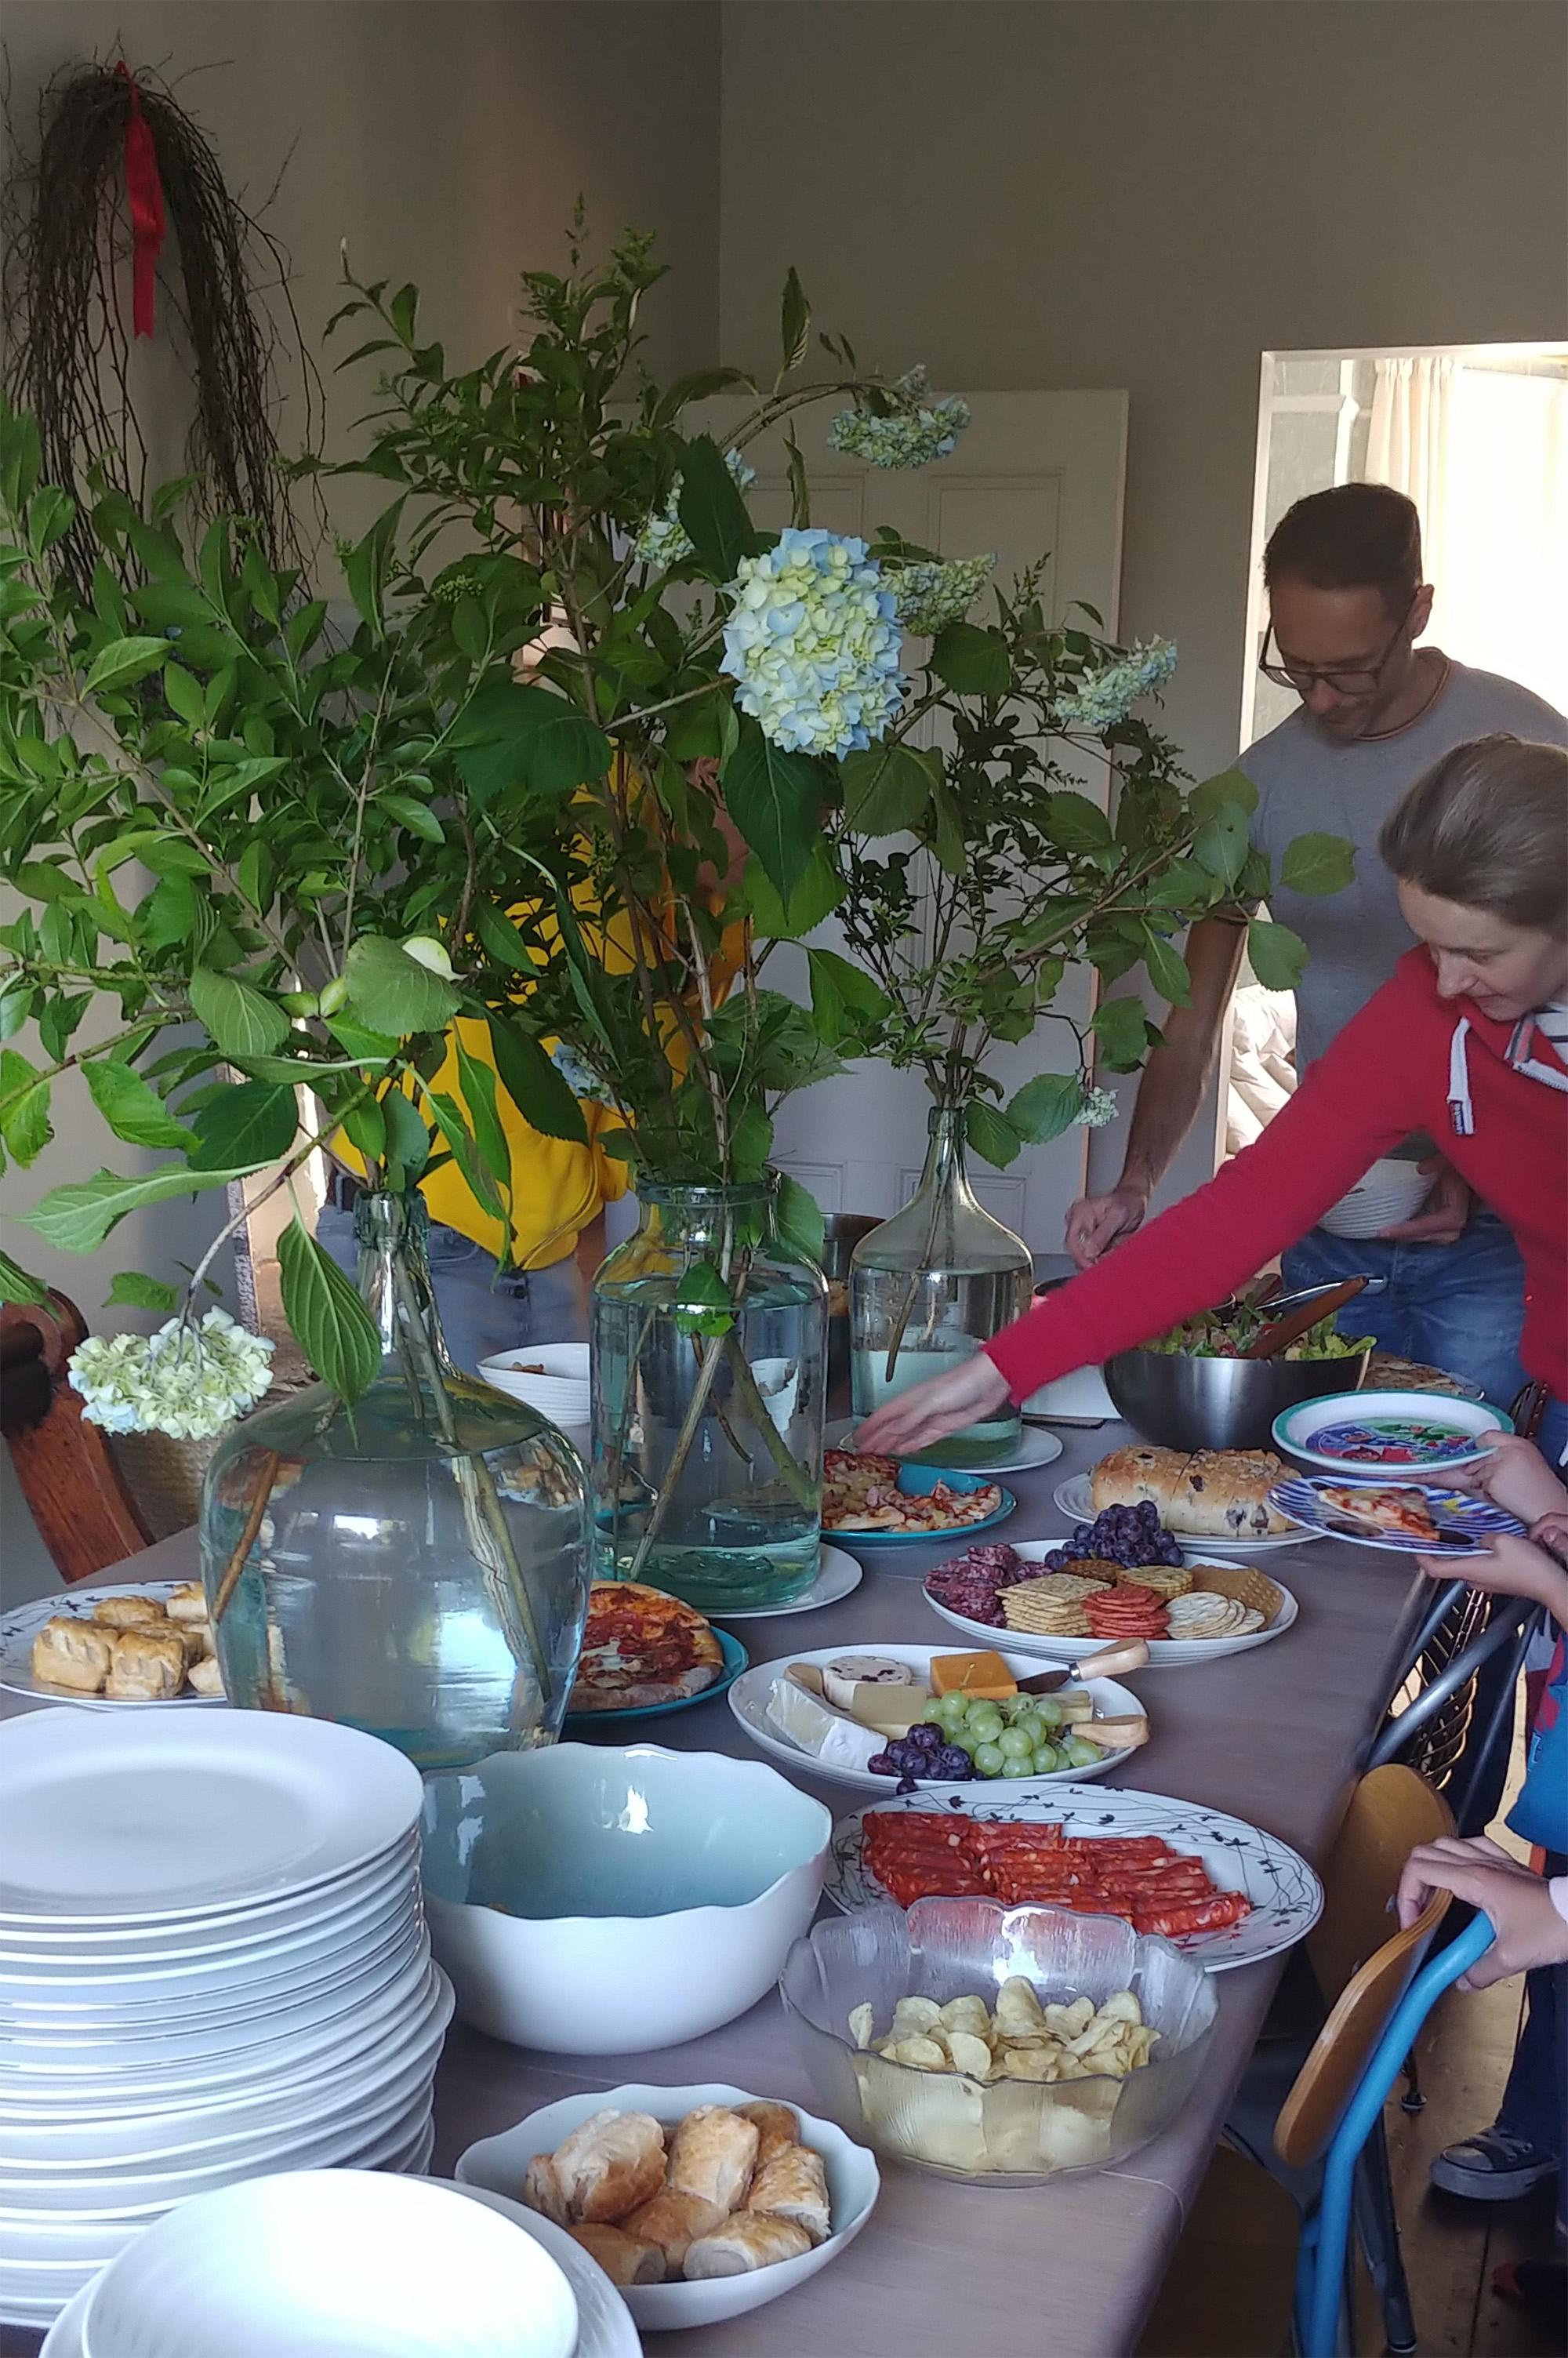 Solstice grub. The hydrangeas were foraged locally ;-)